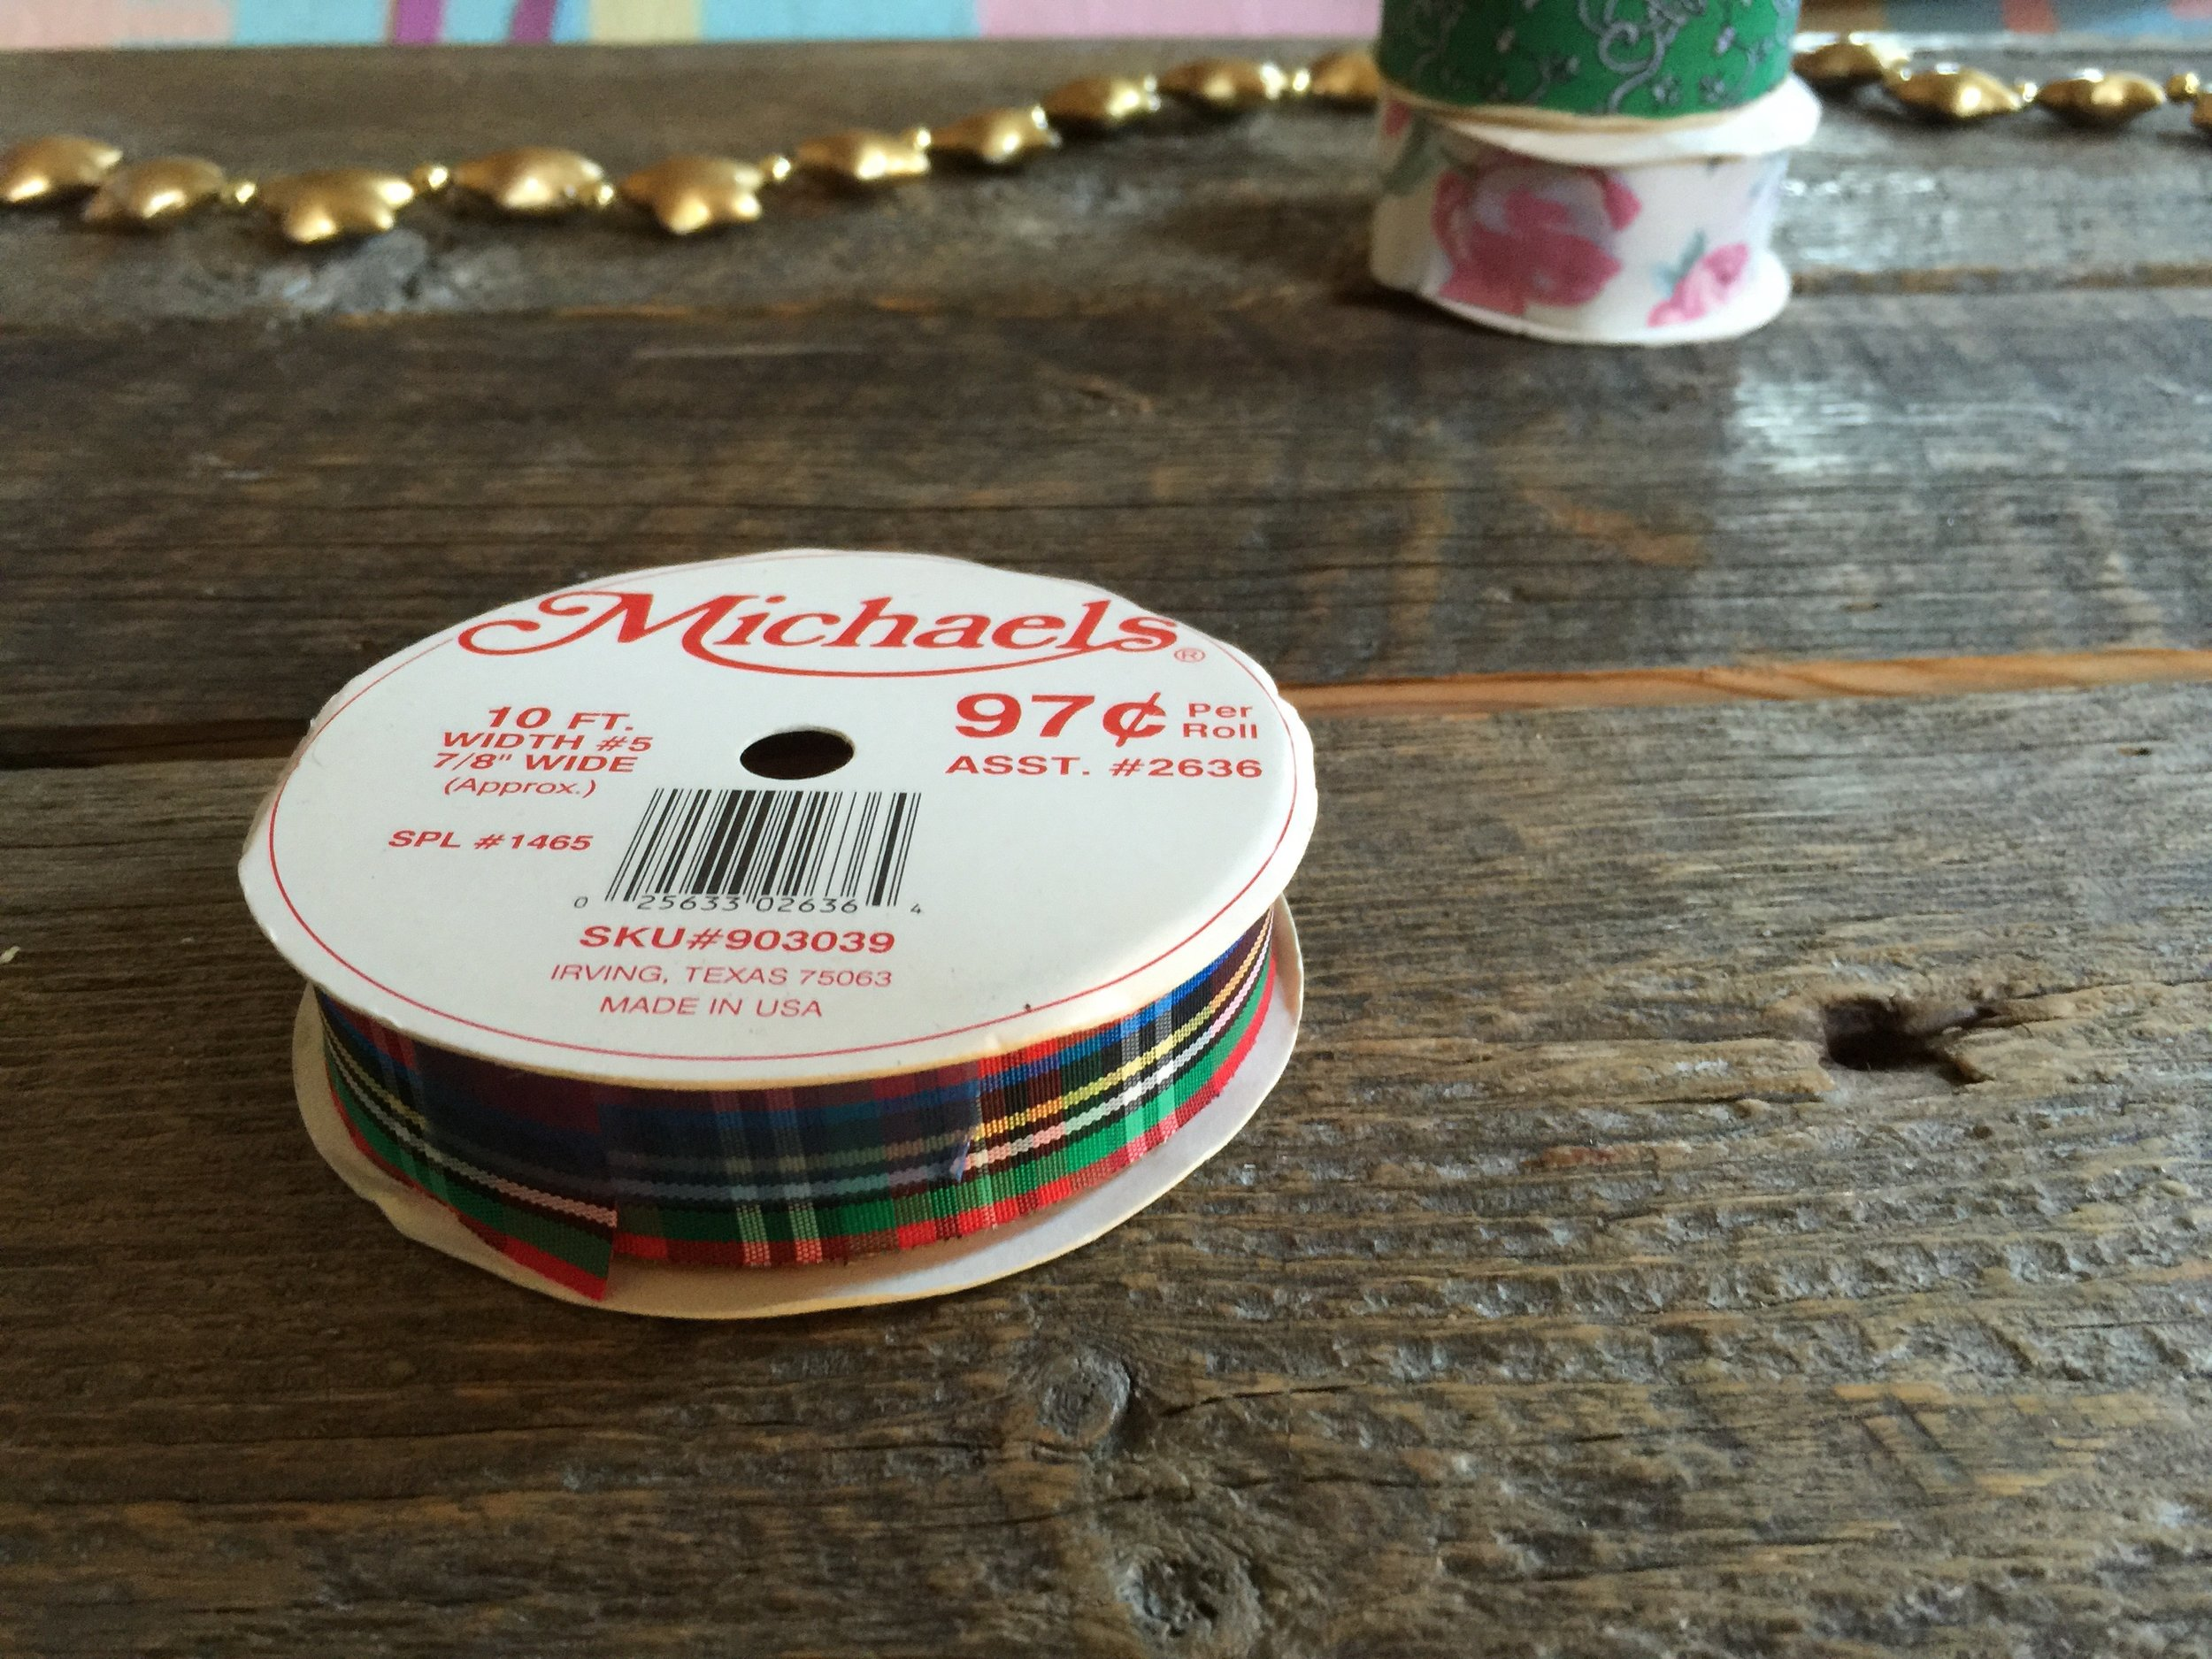 thrifted diy advent calendar9.jpg